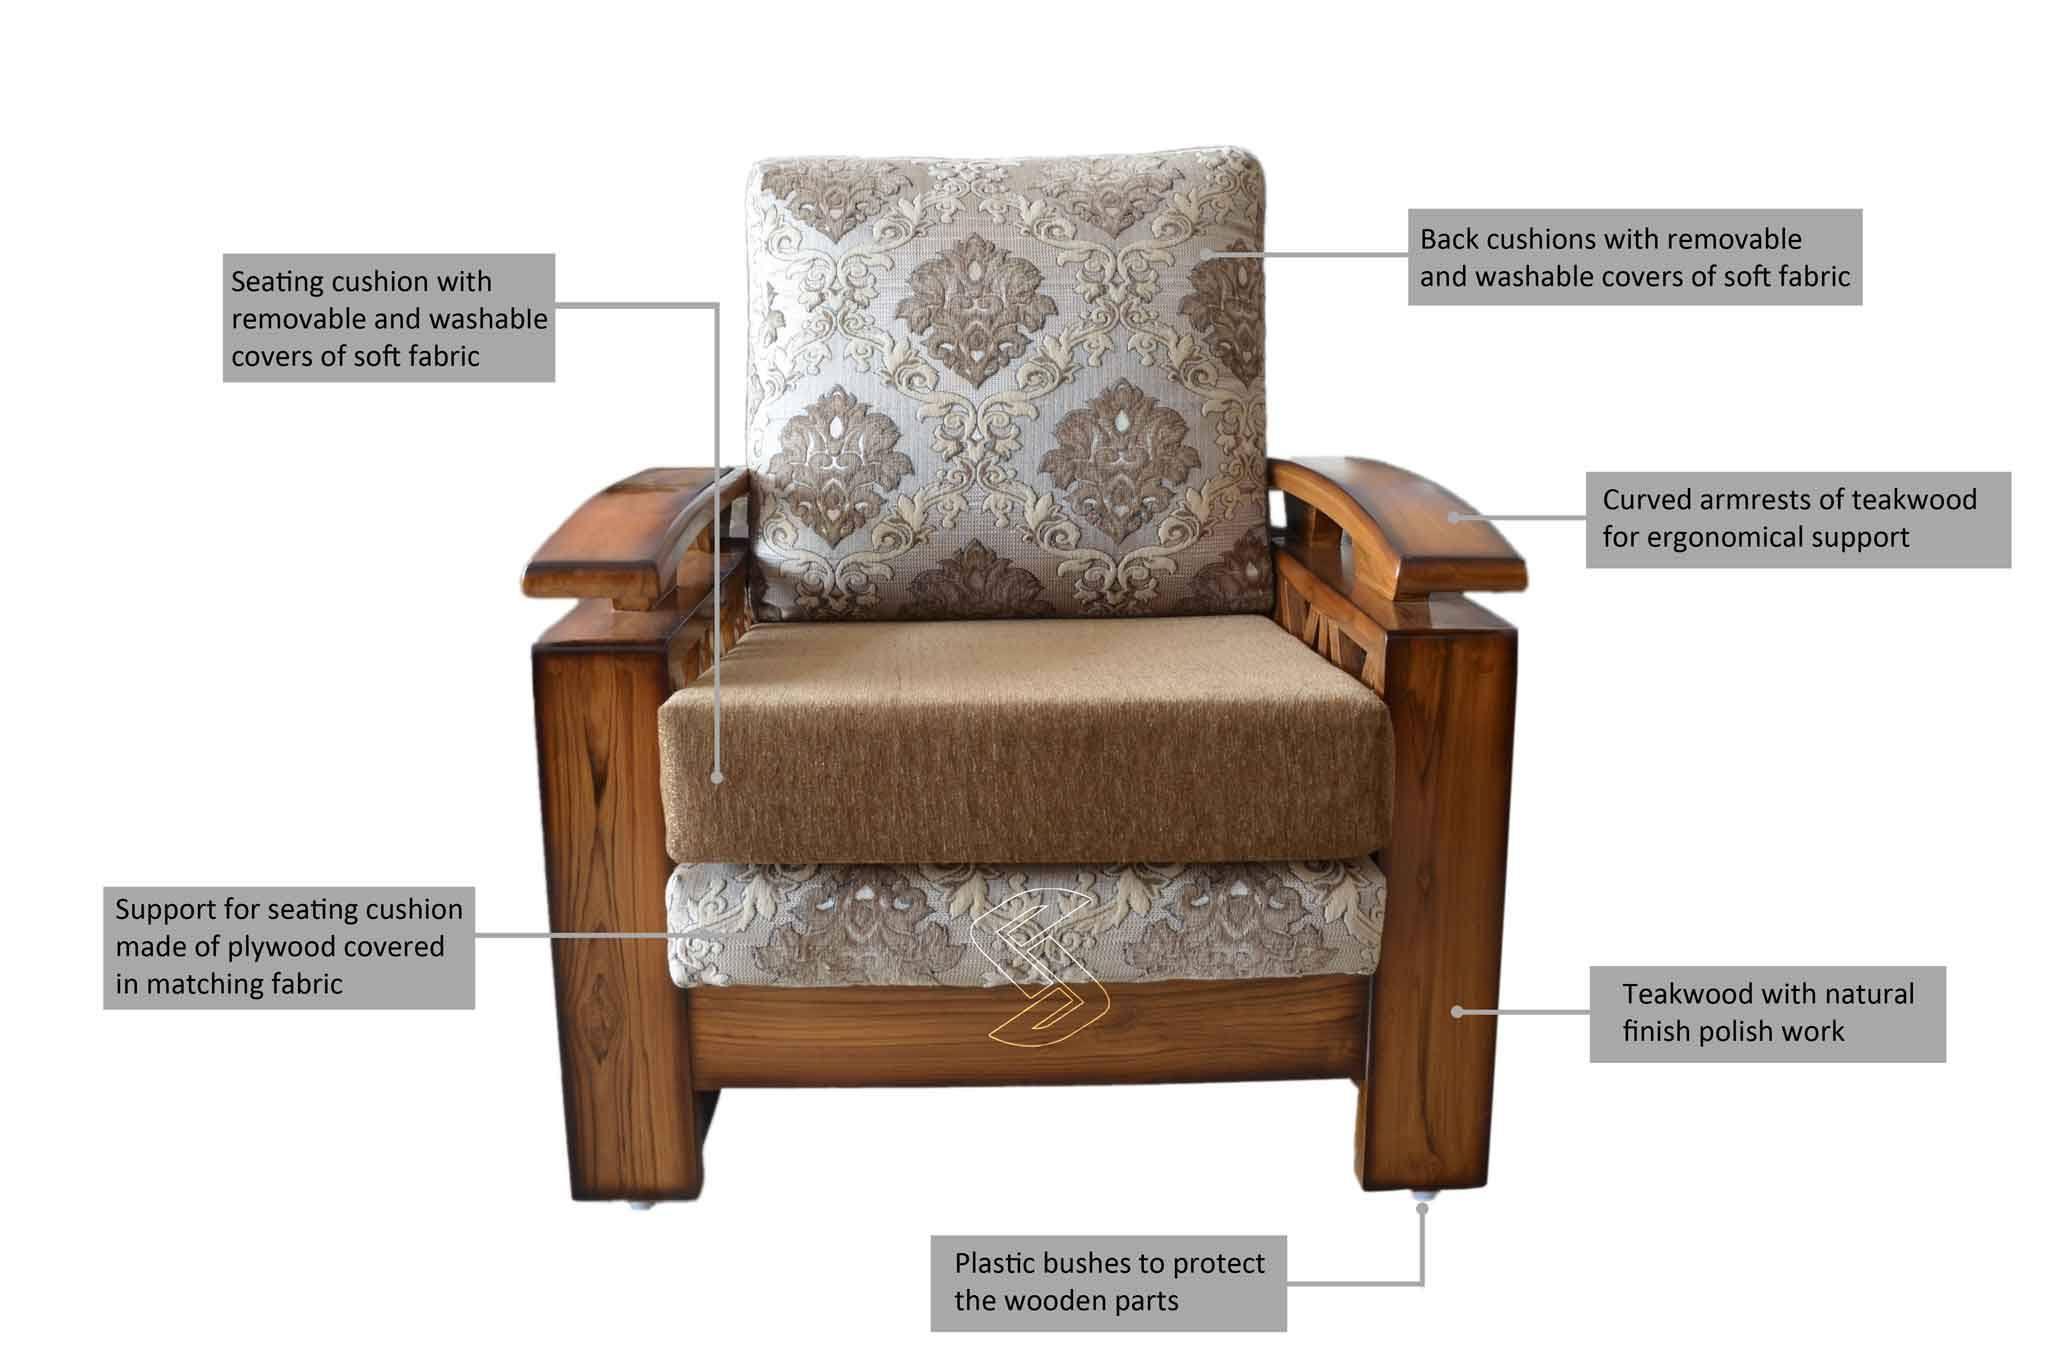 sofa shampoo wash hyderabad antique chippendale price crisso teakwood set sets online in